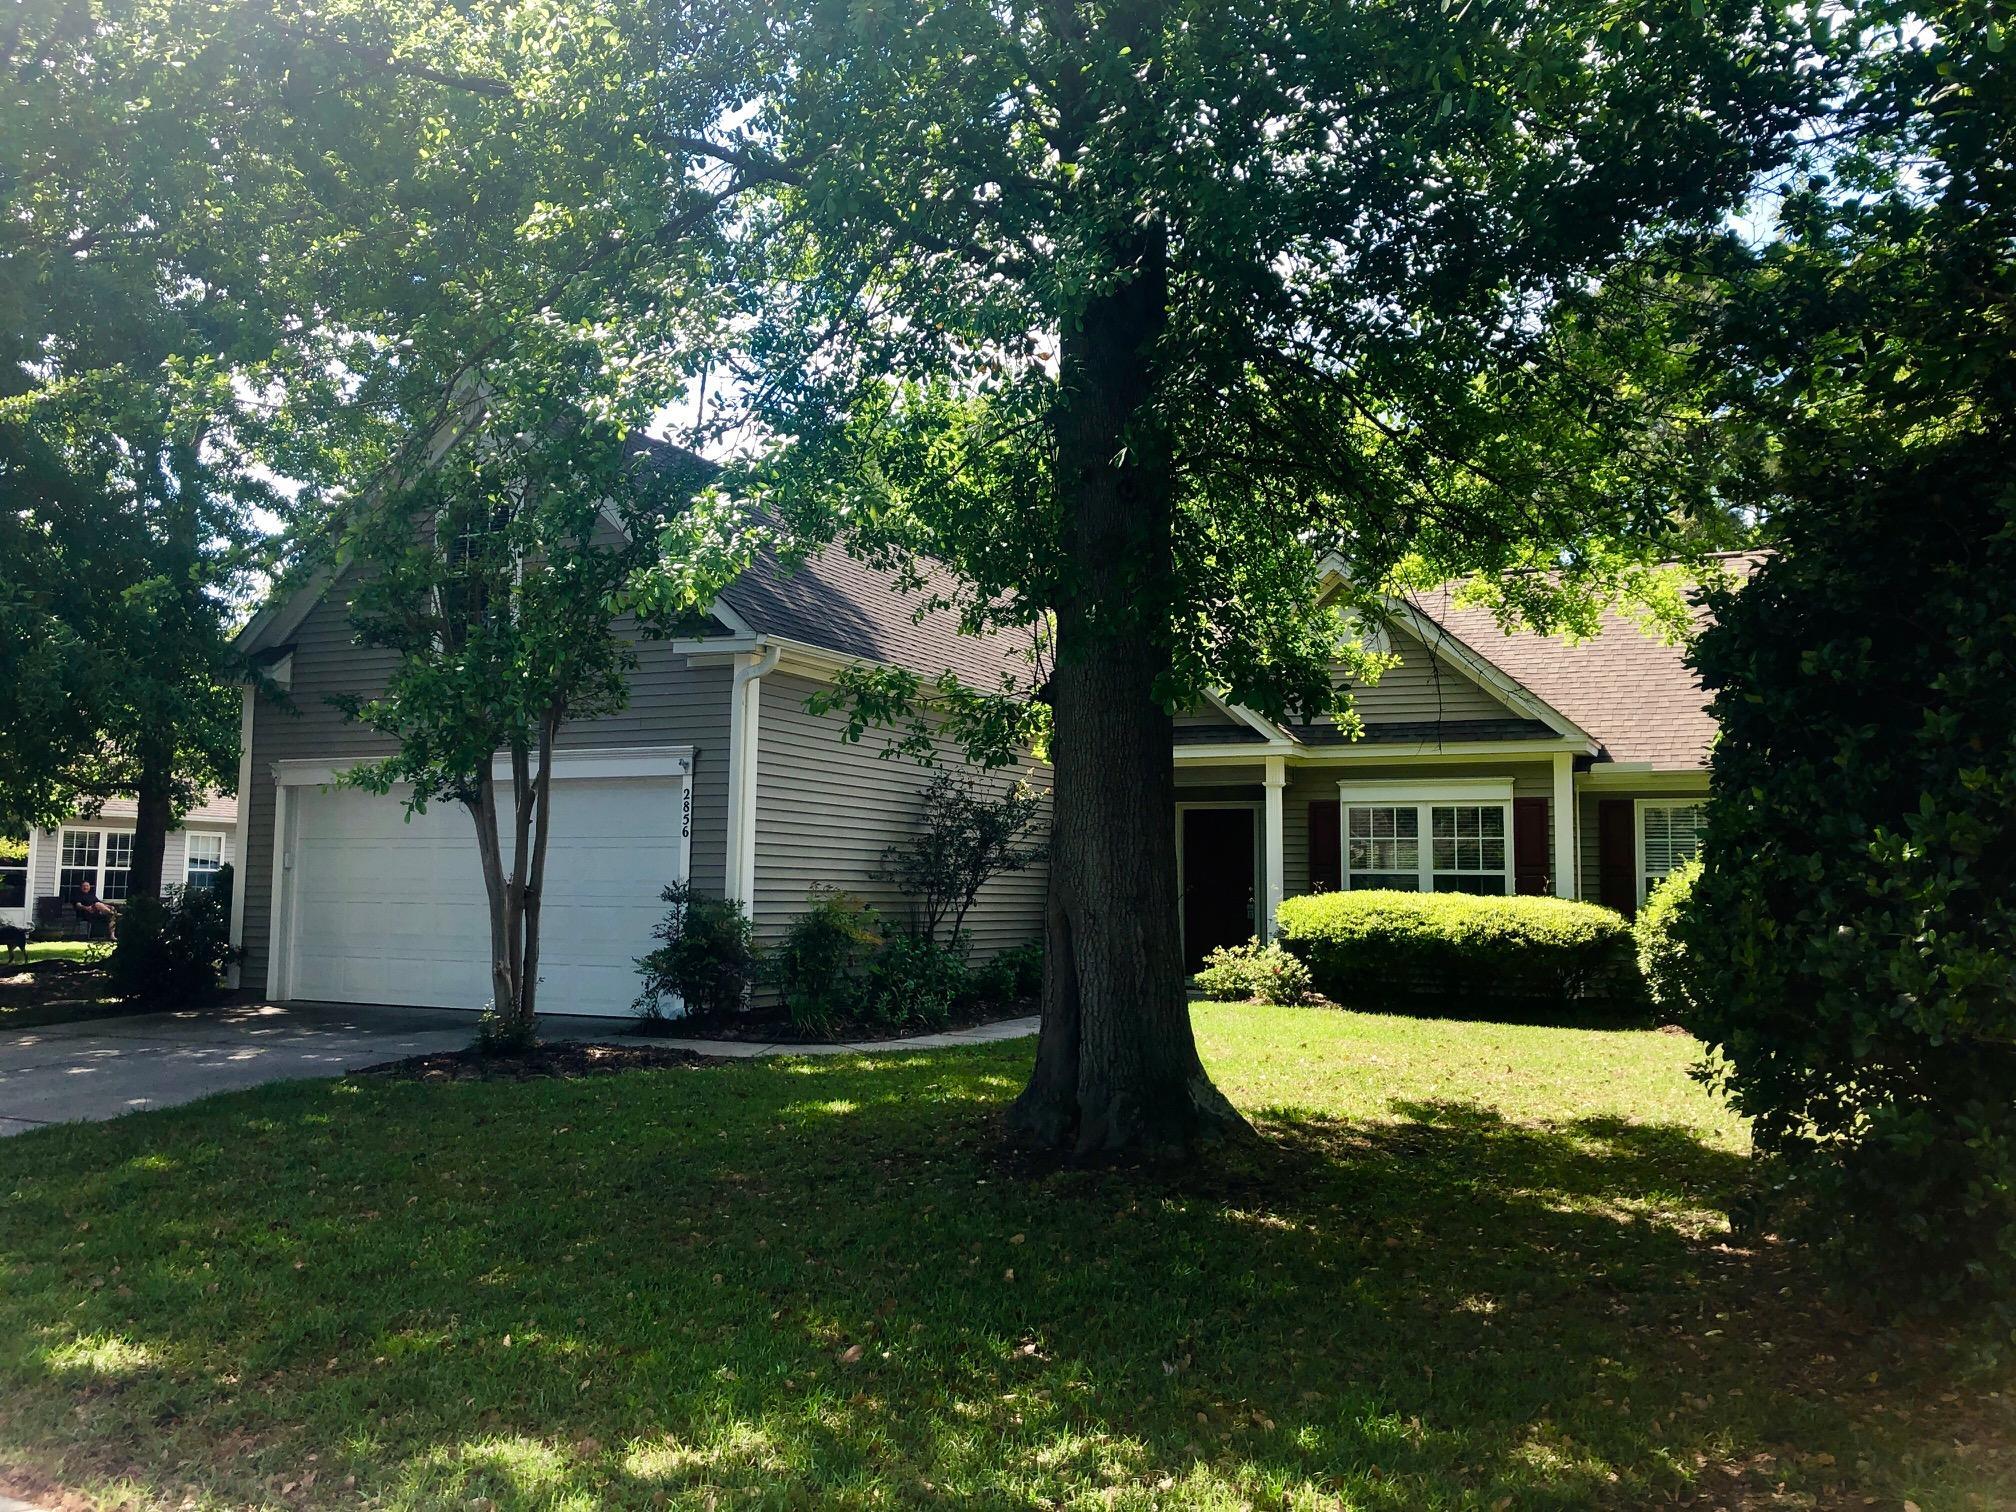 Planters Pointe Homes For Sale - 2856 Curran, Mount Pleasant, SC - 39